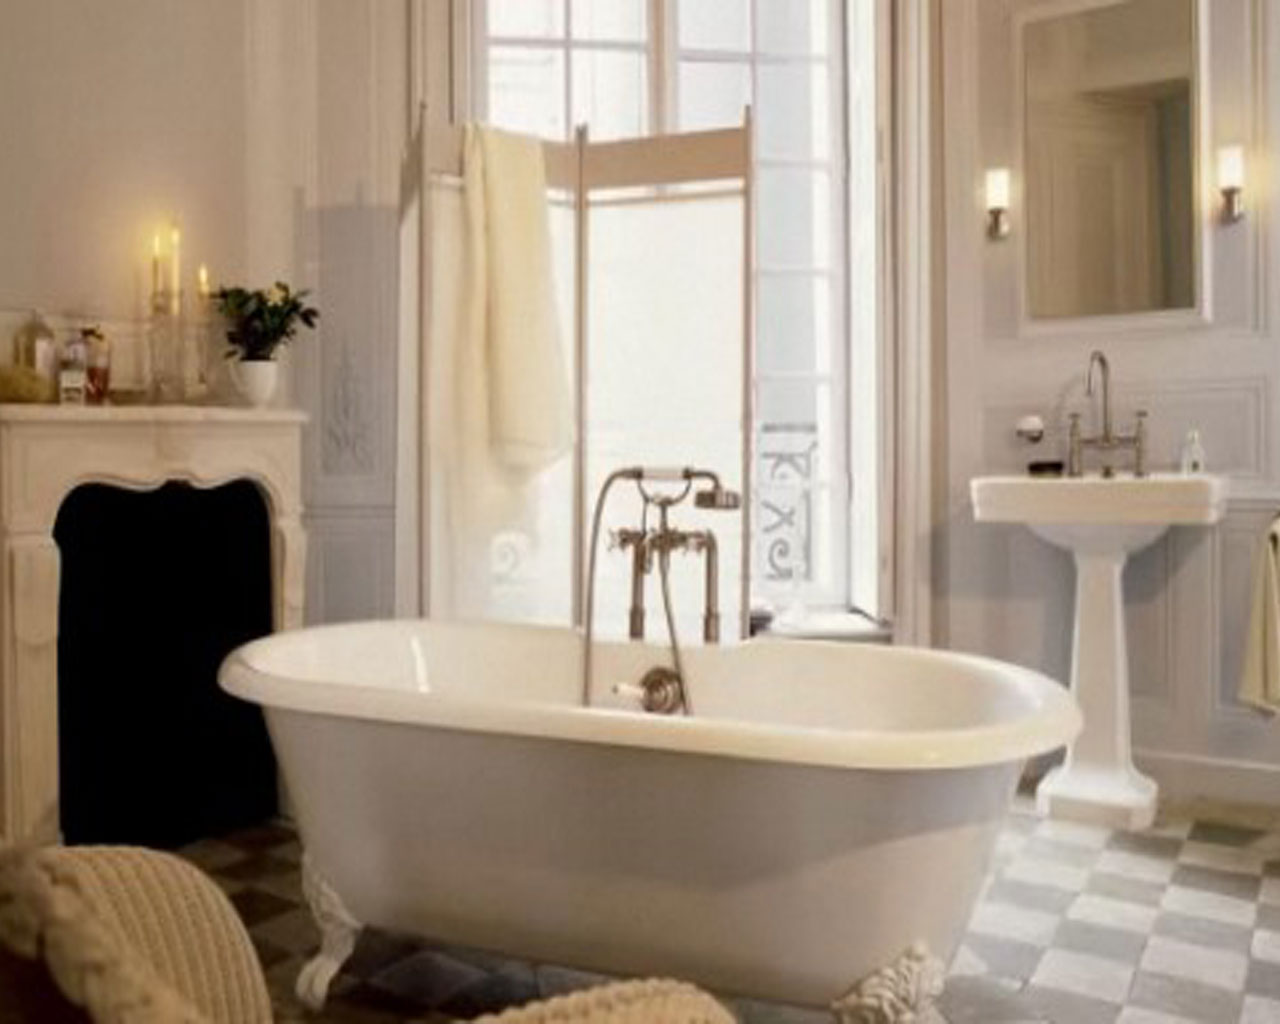 wallpaper ideas home design ideas lesitedeclaudiacom download. beautiful ideas. Home Design Ideas